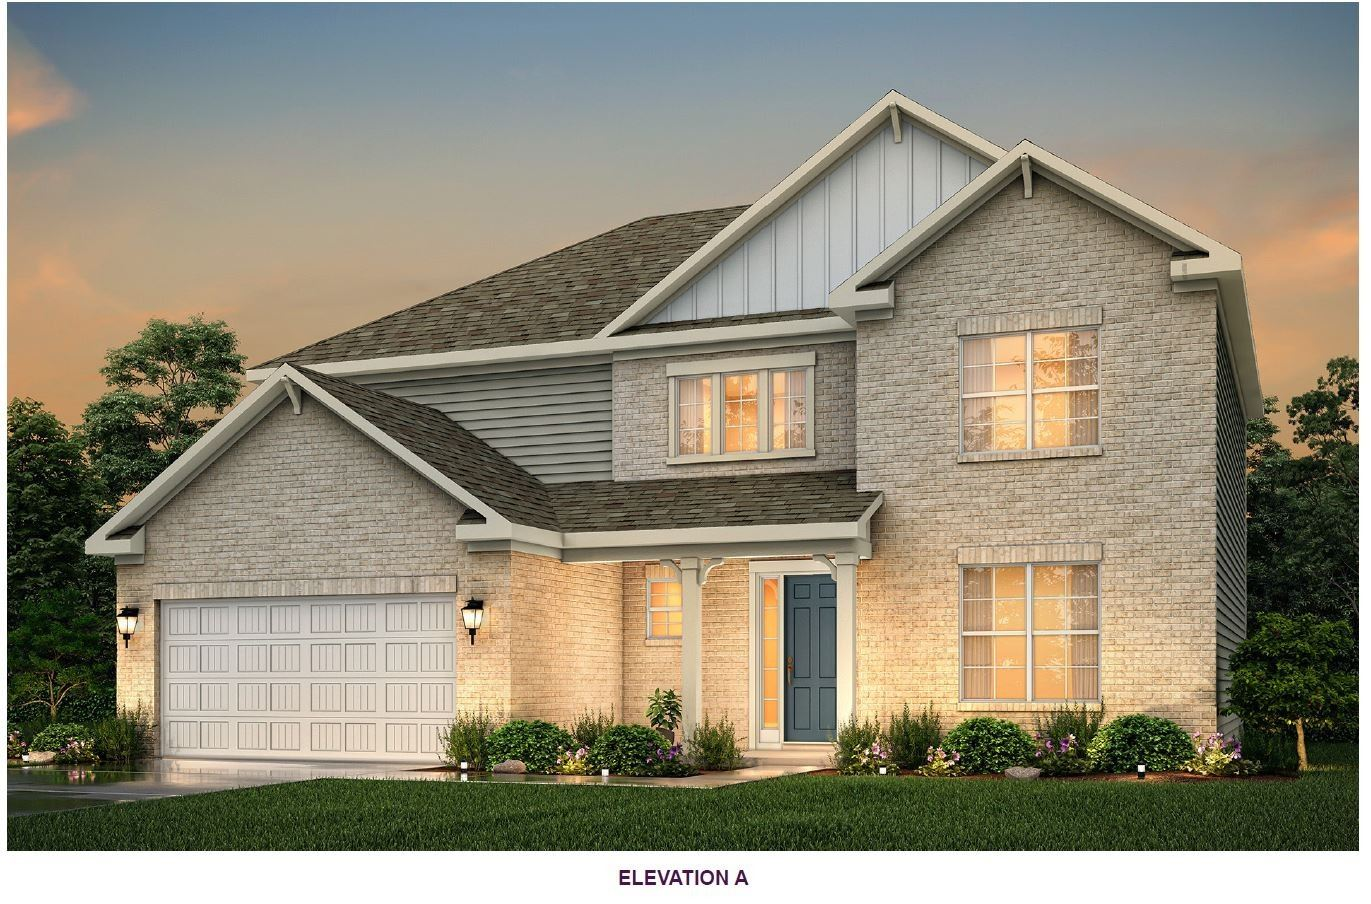 Photo of 3910 Bomeadows Drive (Lot 379), Murfreesboro, TN 37128 (MLS # 2247606)